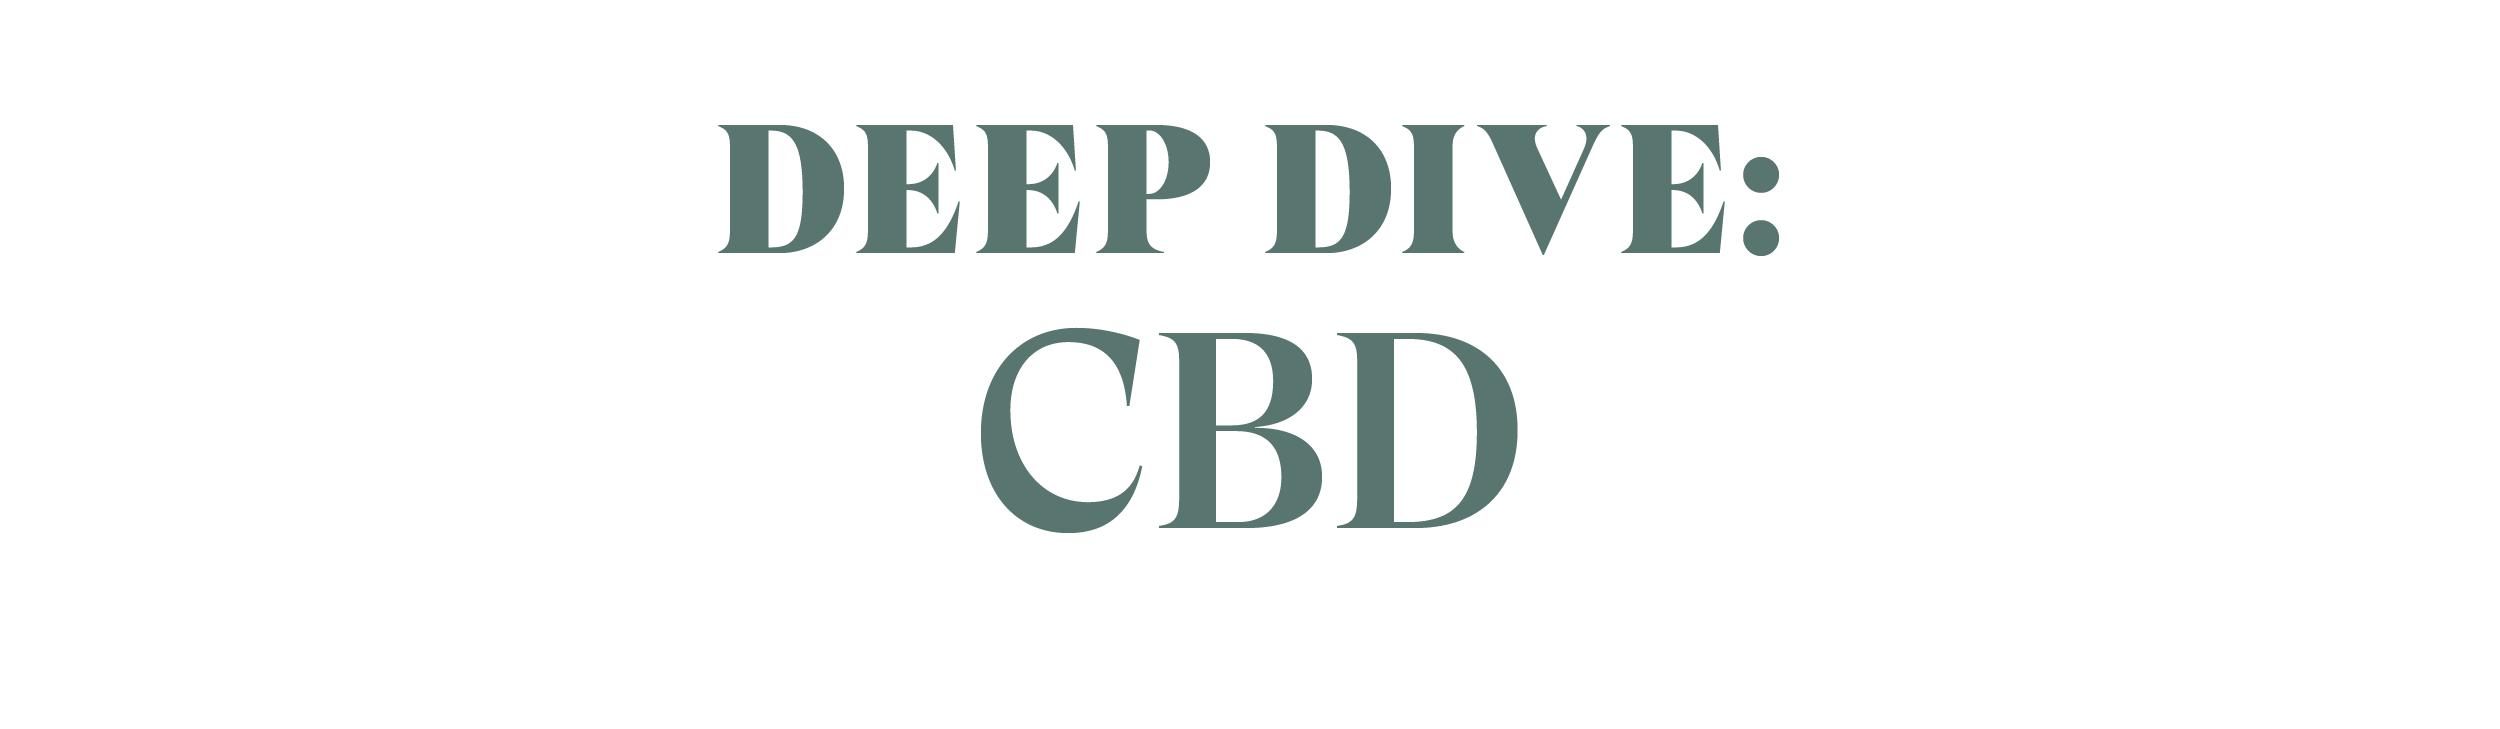 welltribe_deepdive_cbd.png